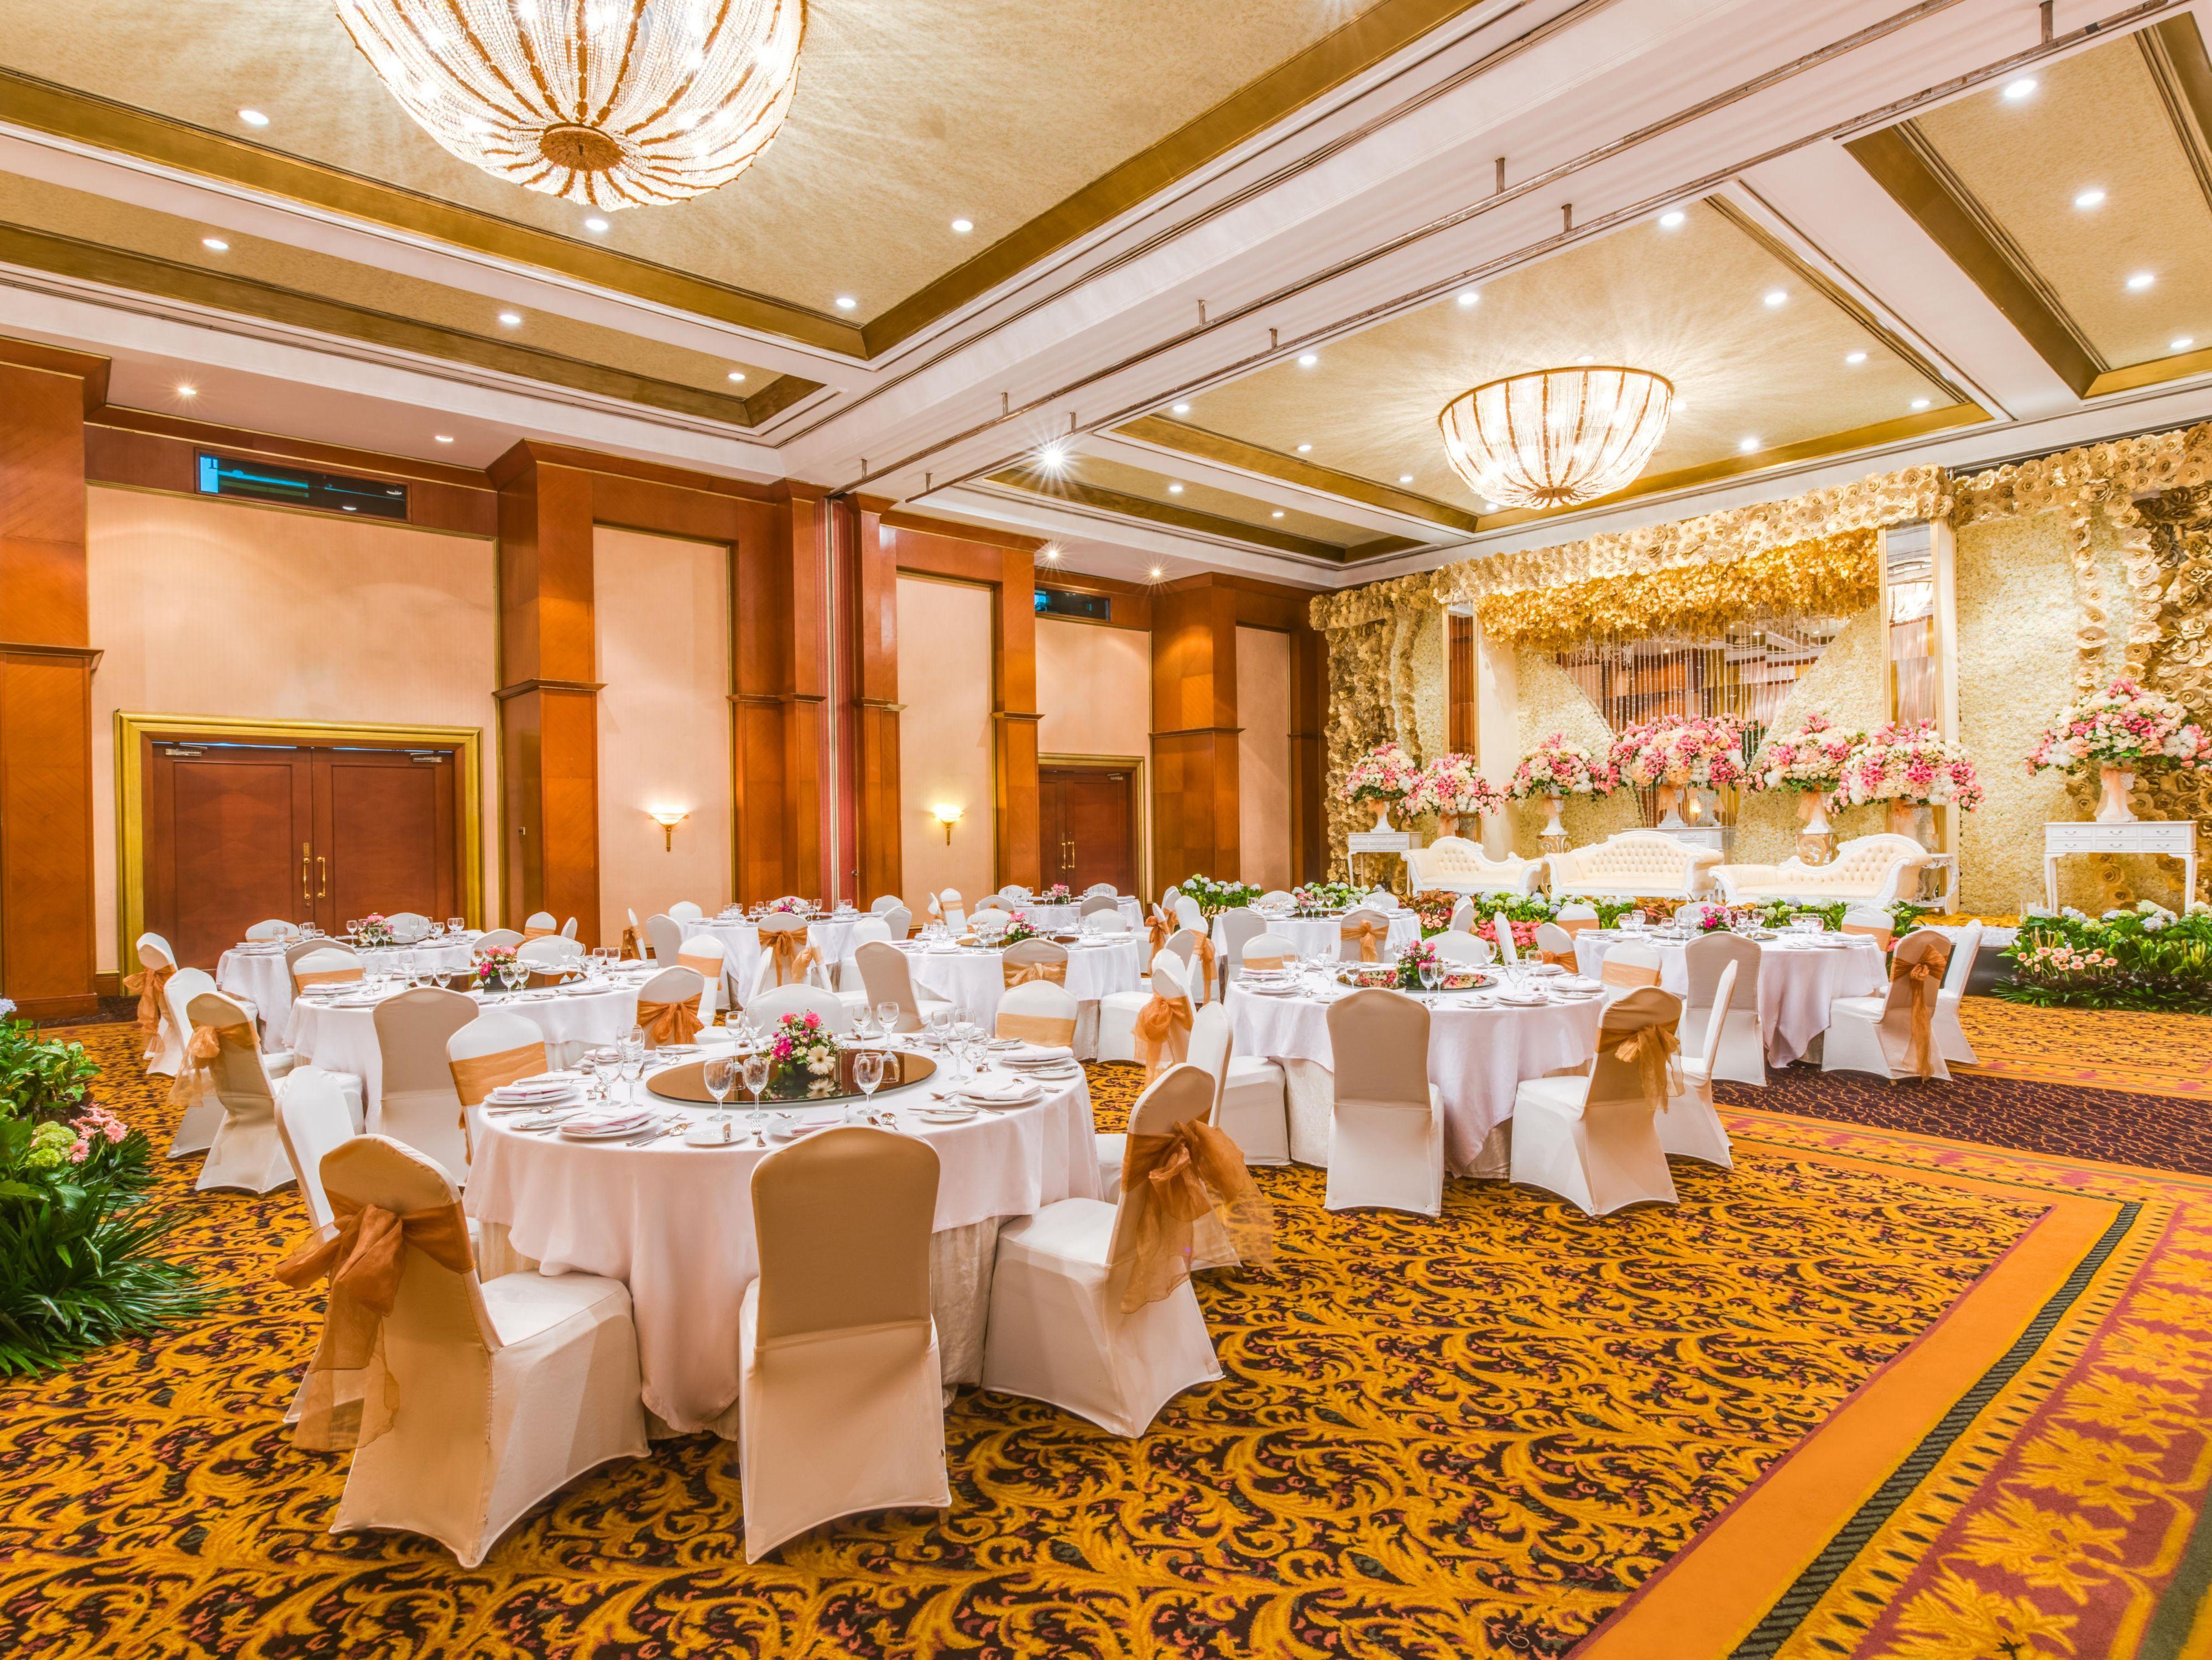 Crowne plaza jakarta hotel meeting rooms for rent tiara ballroom wedding reception junglespirit Gallery